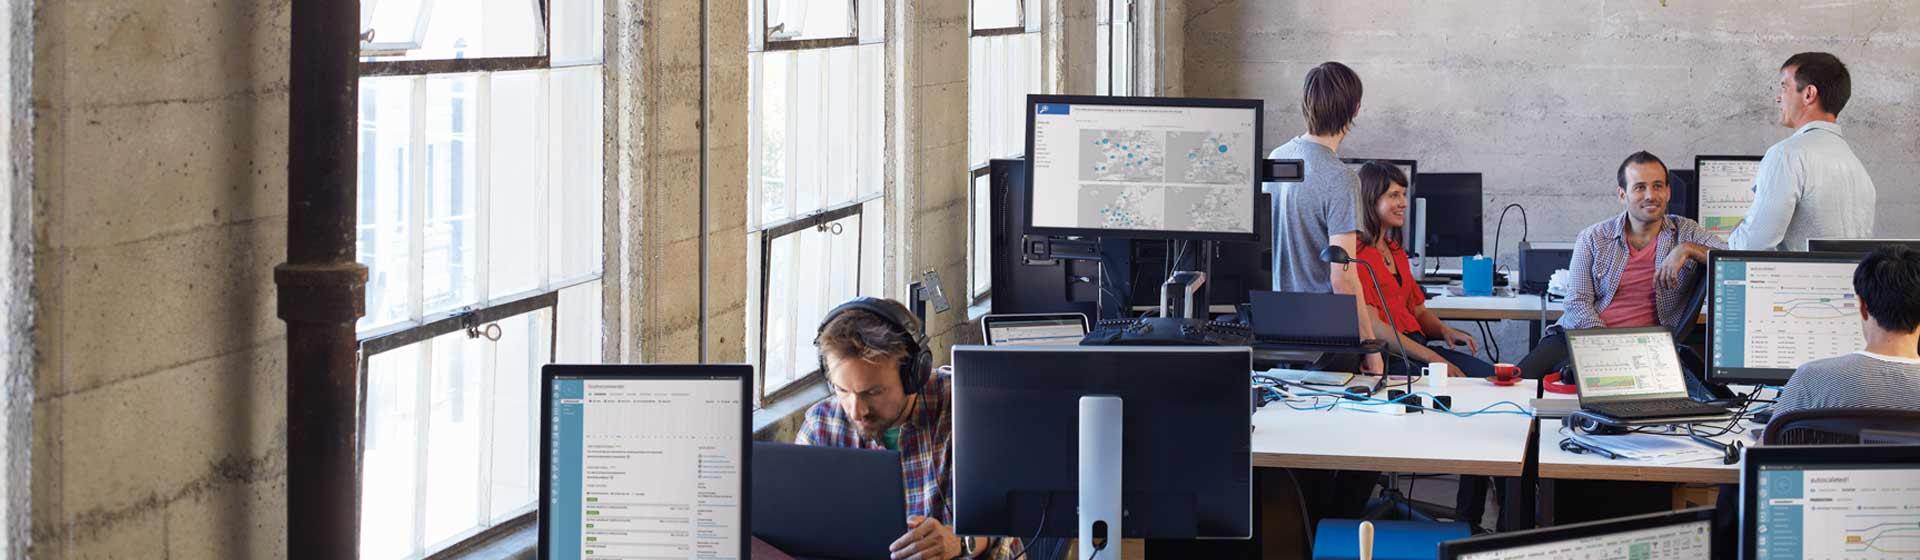 Office 365를 실행하는 컴퓨터로 가득한 사무실에서 책상 주위에 앉아 있거나 서 있는 동료들